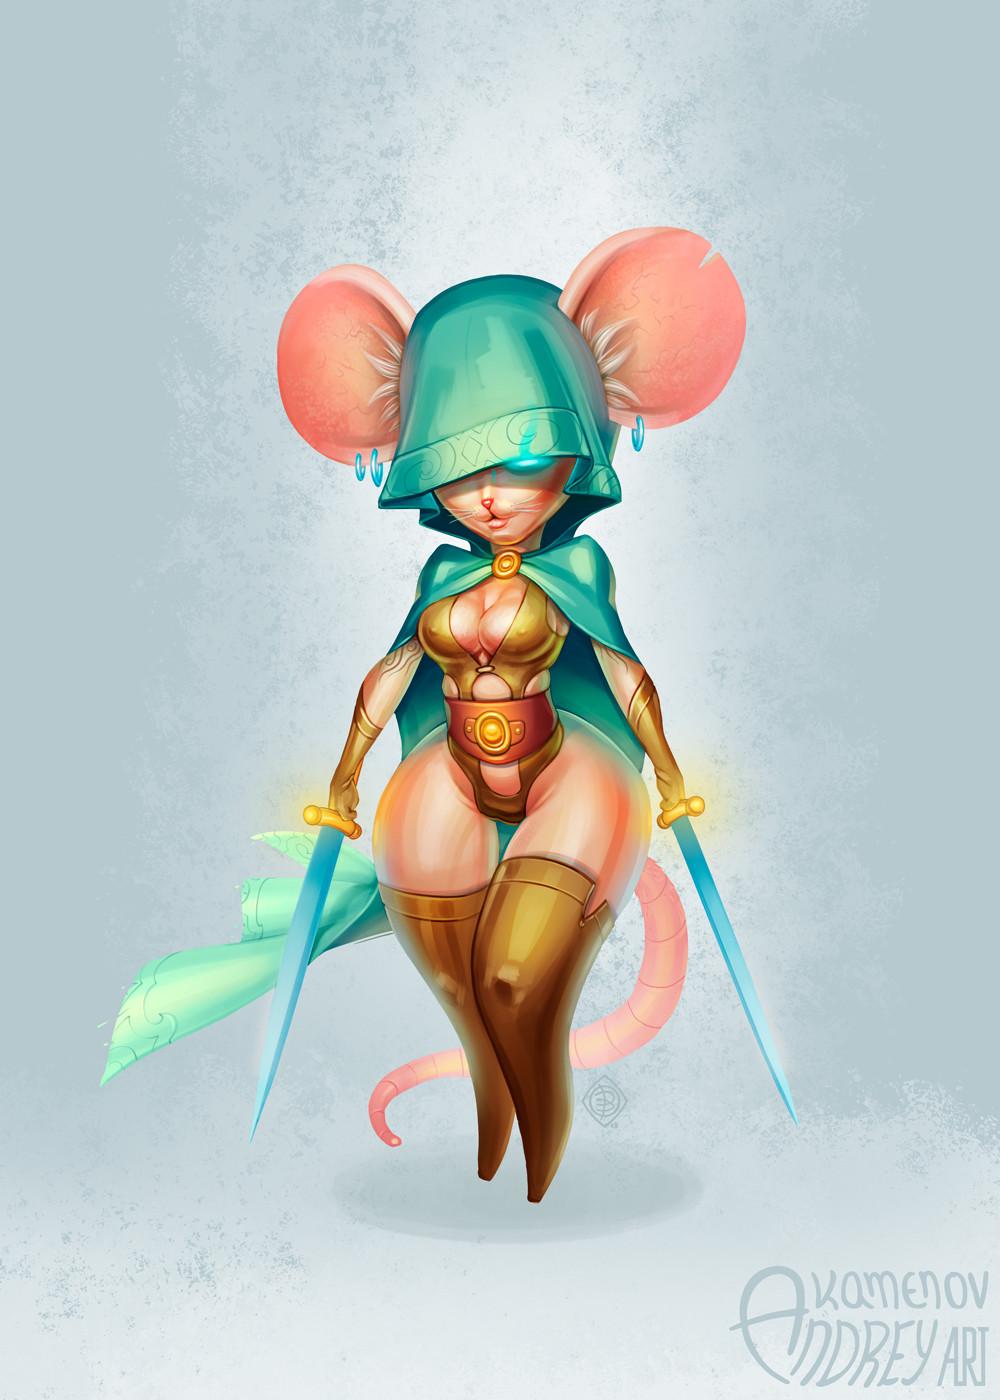 Andrey kamenov mousewarrior she 06